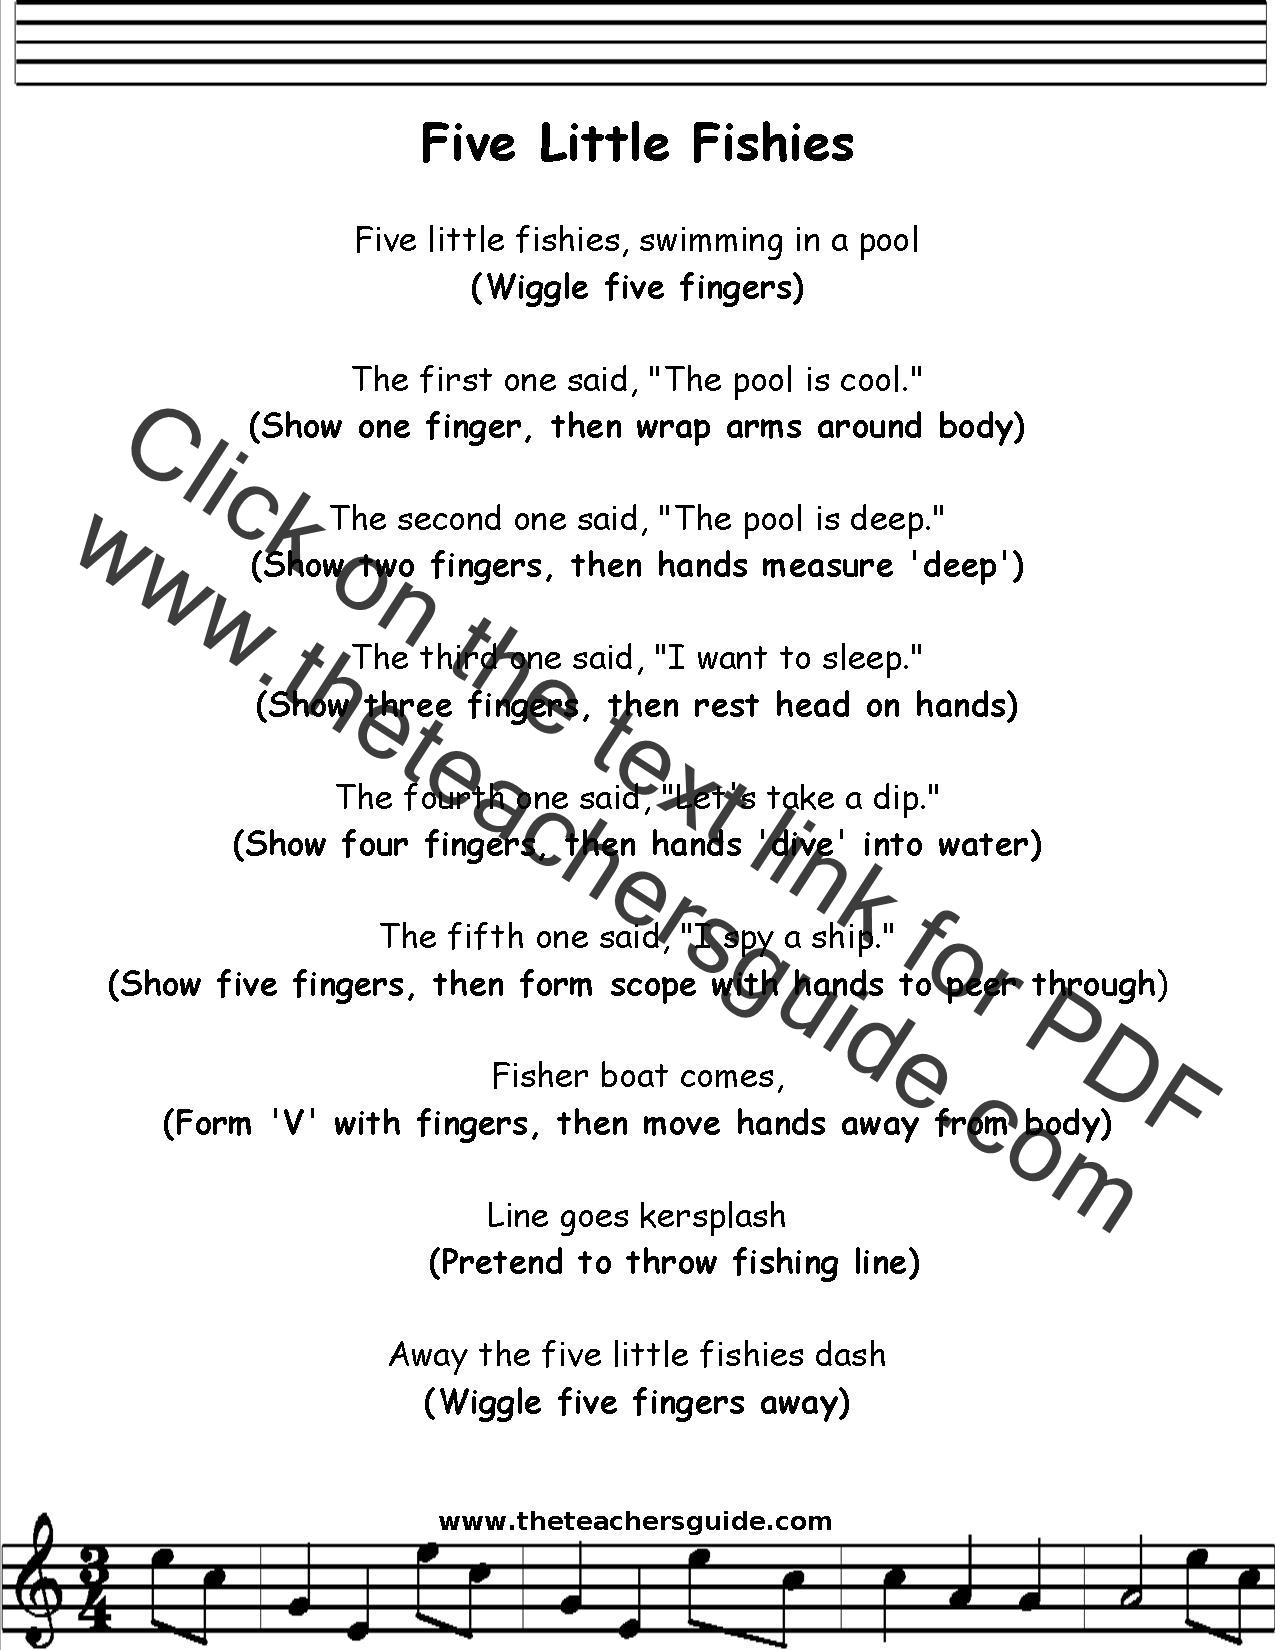 Five Little Fishies Lyrics Printout Midi And Video